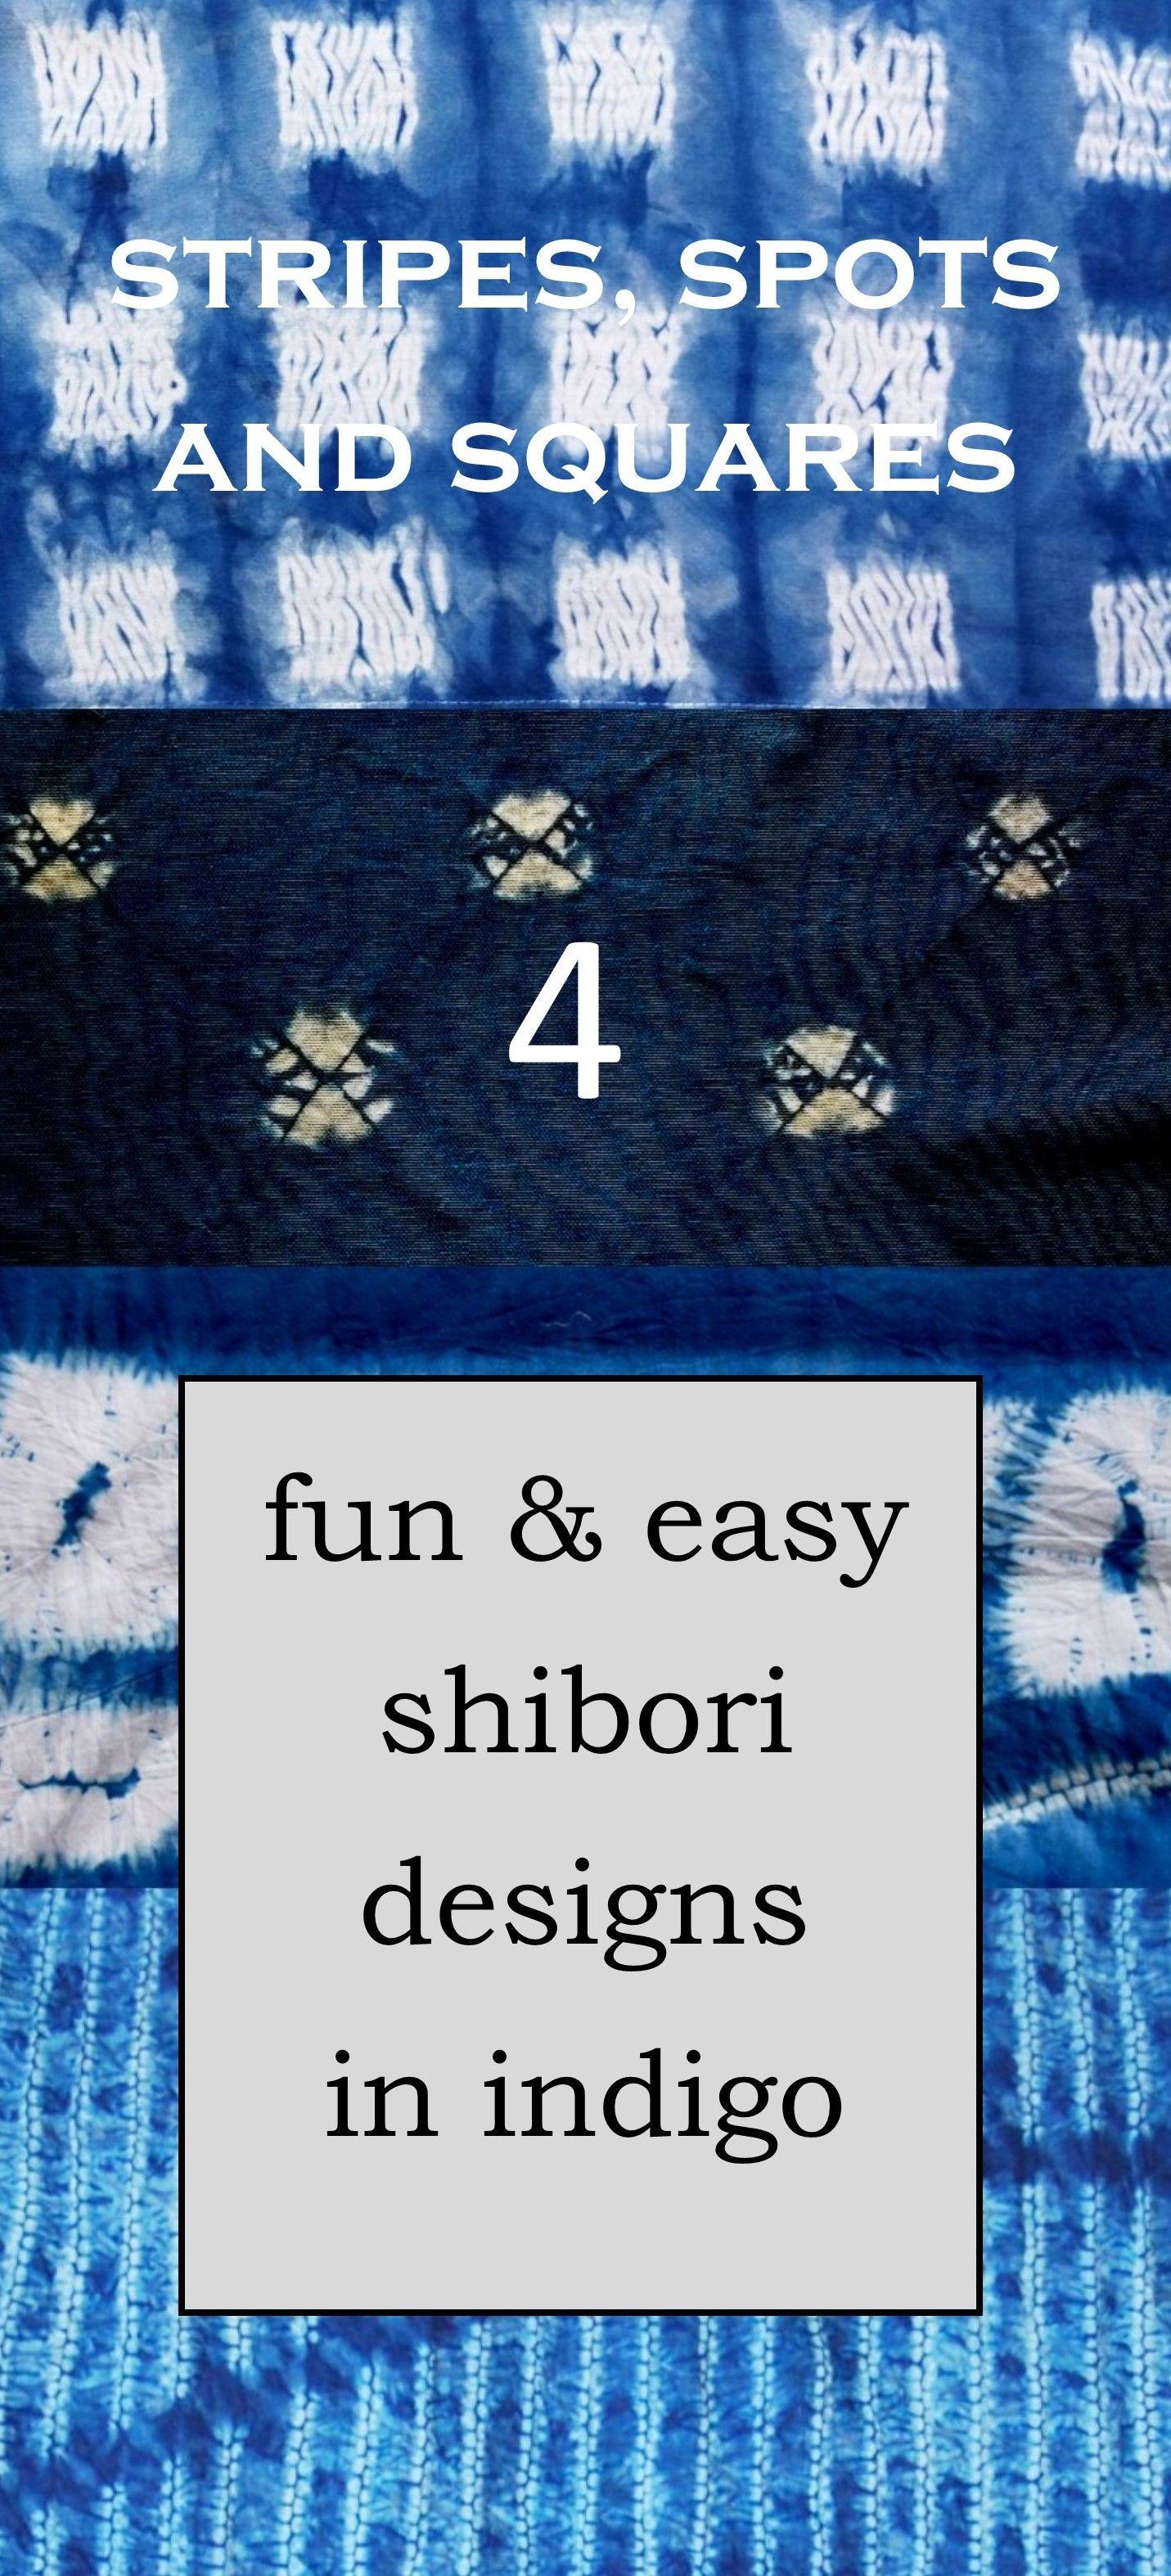 Make stripes, spots and squares 4 fun and easy shibori